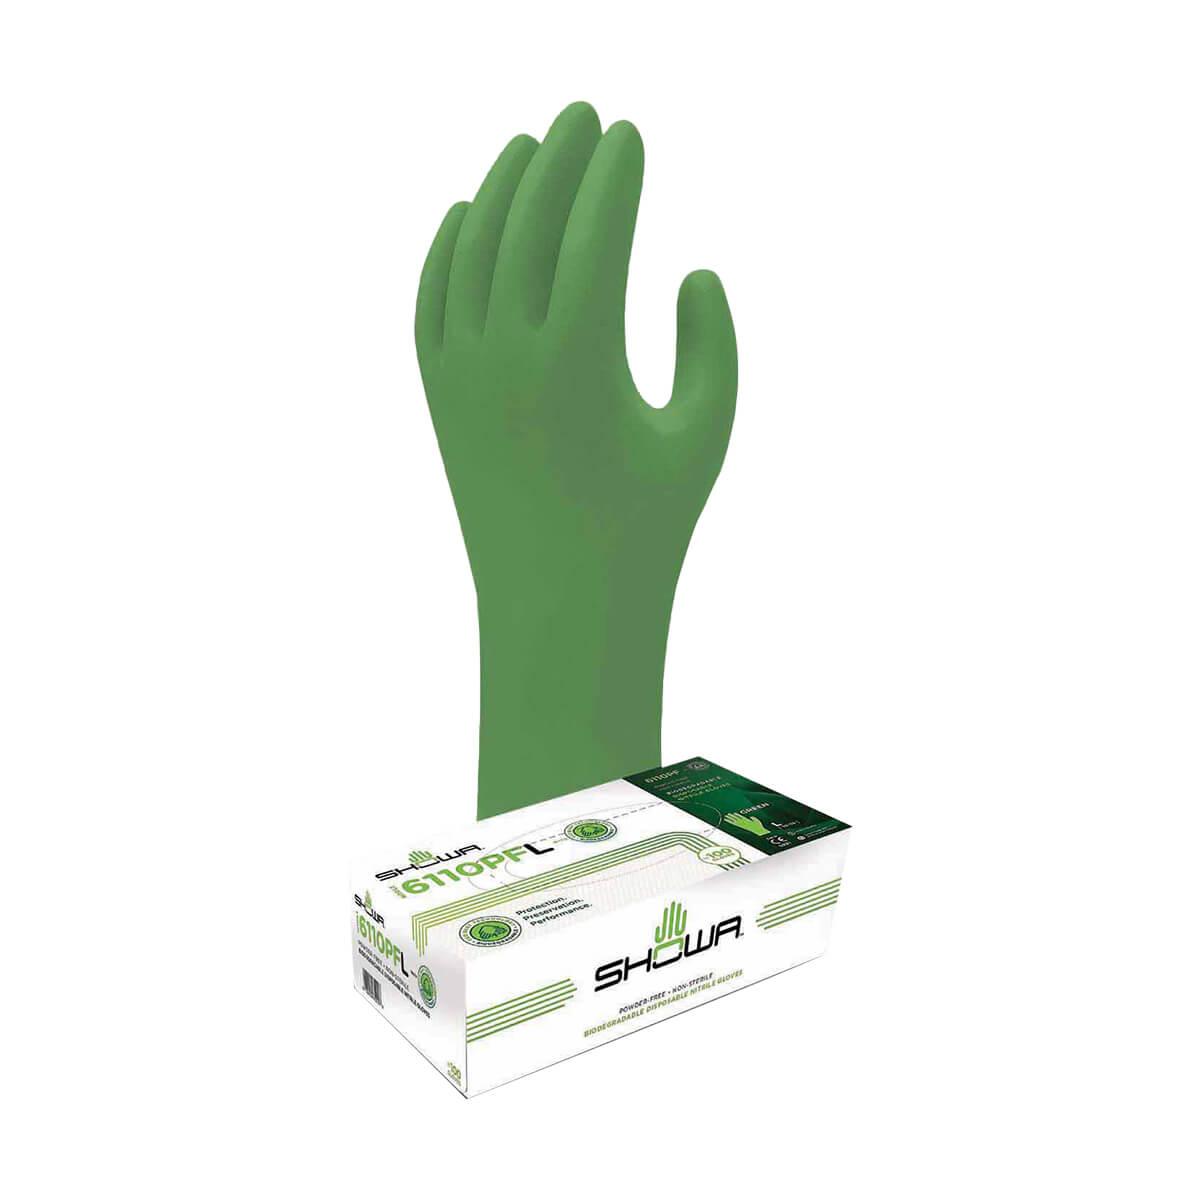 Gloves - Nitrile - Green-Dex Biodegradable - XL 100 pack